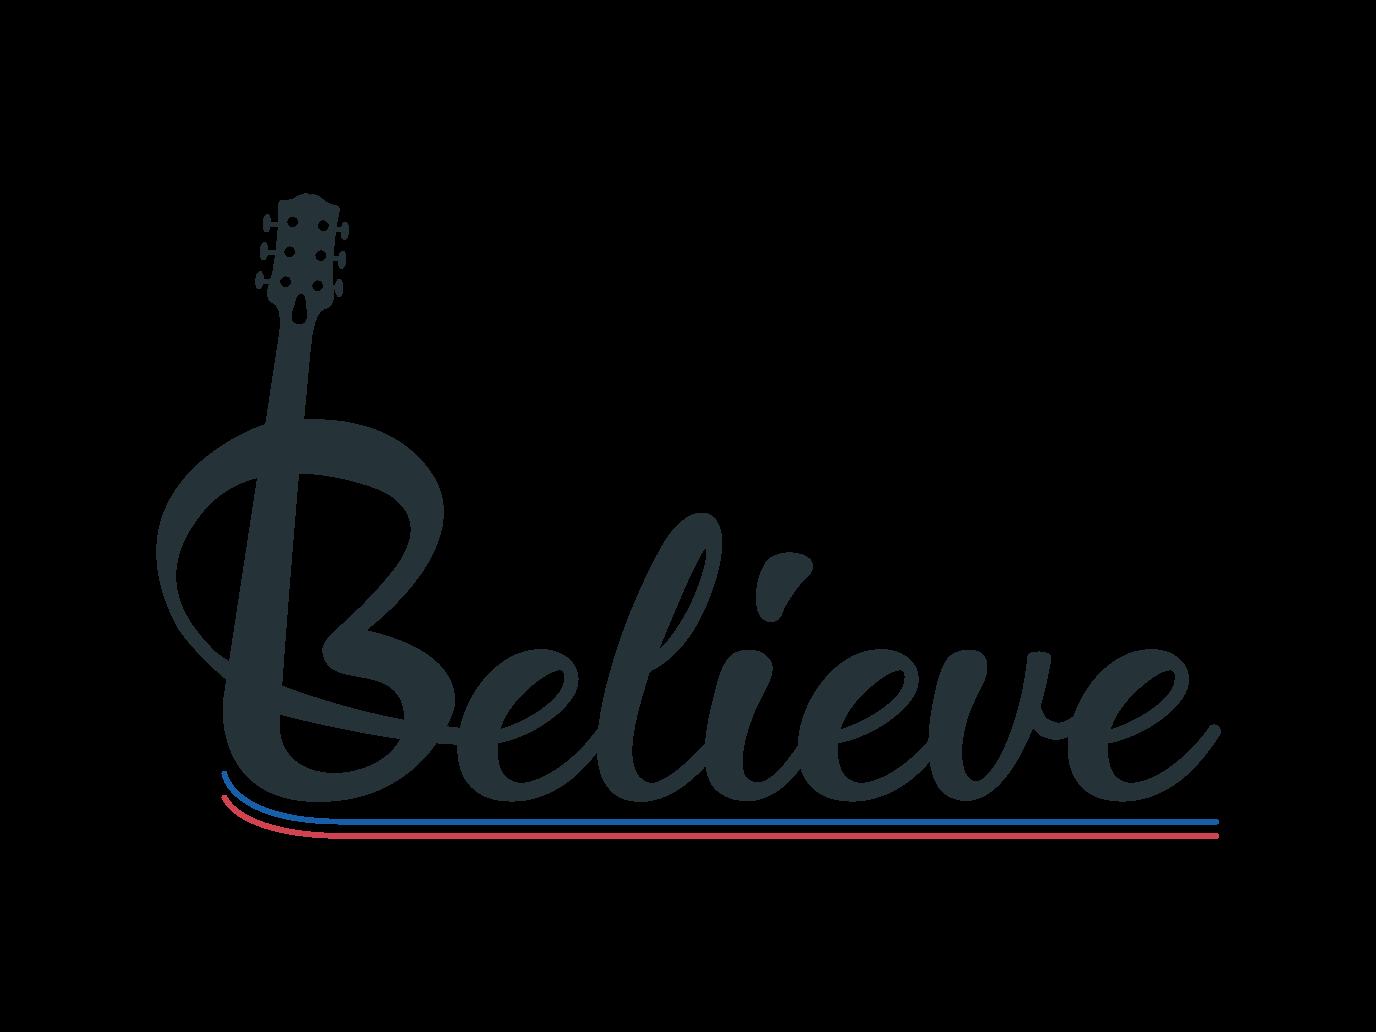 music band believe entertainment app dribbble company save nice guys mark production brand marketing